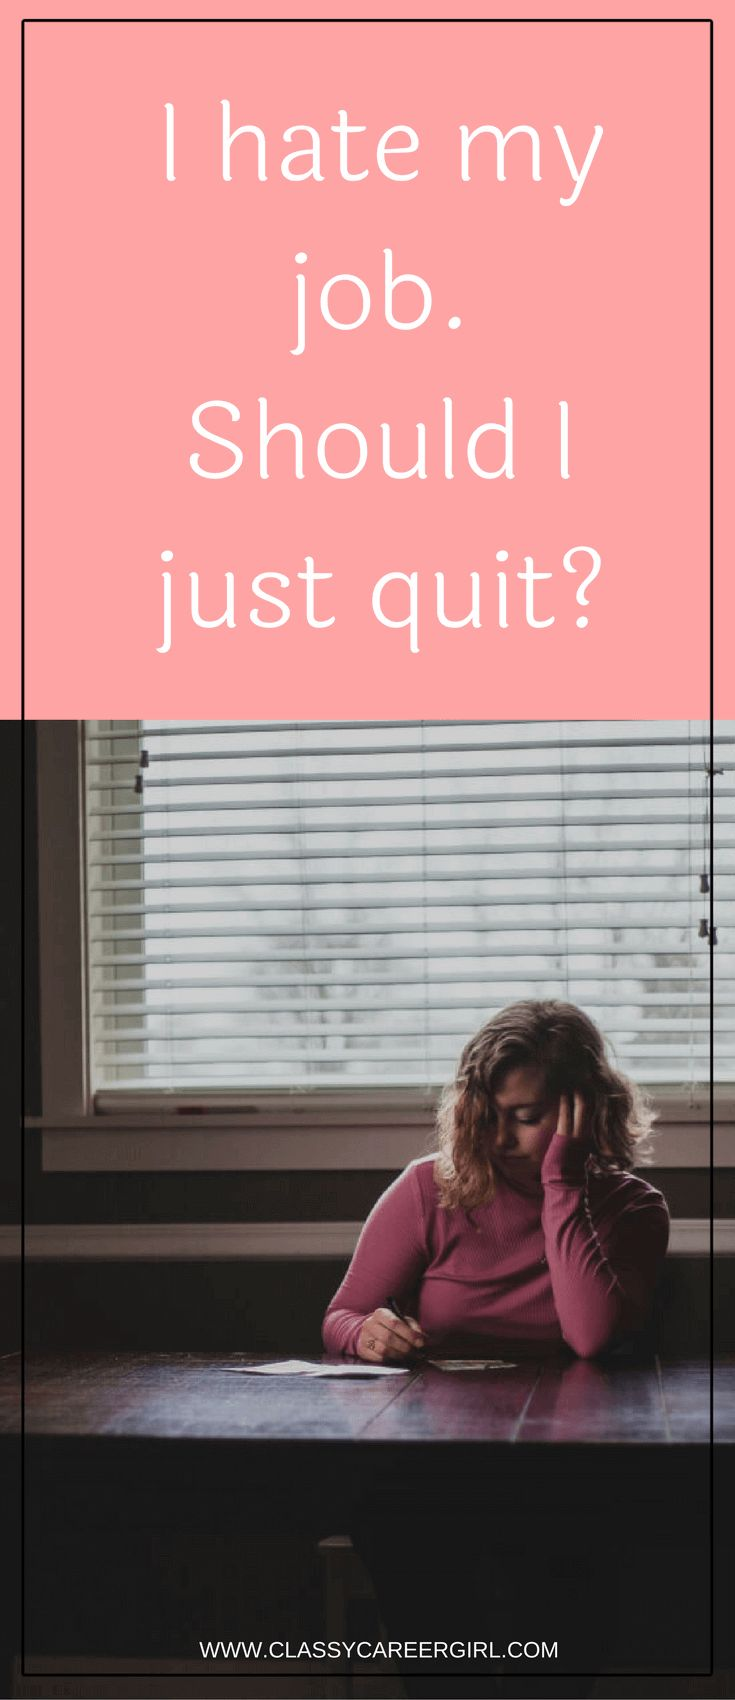 17 Best Ideas About Hate My Job On Pinterest